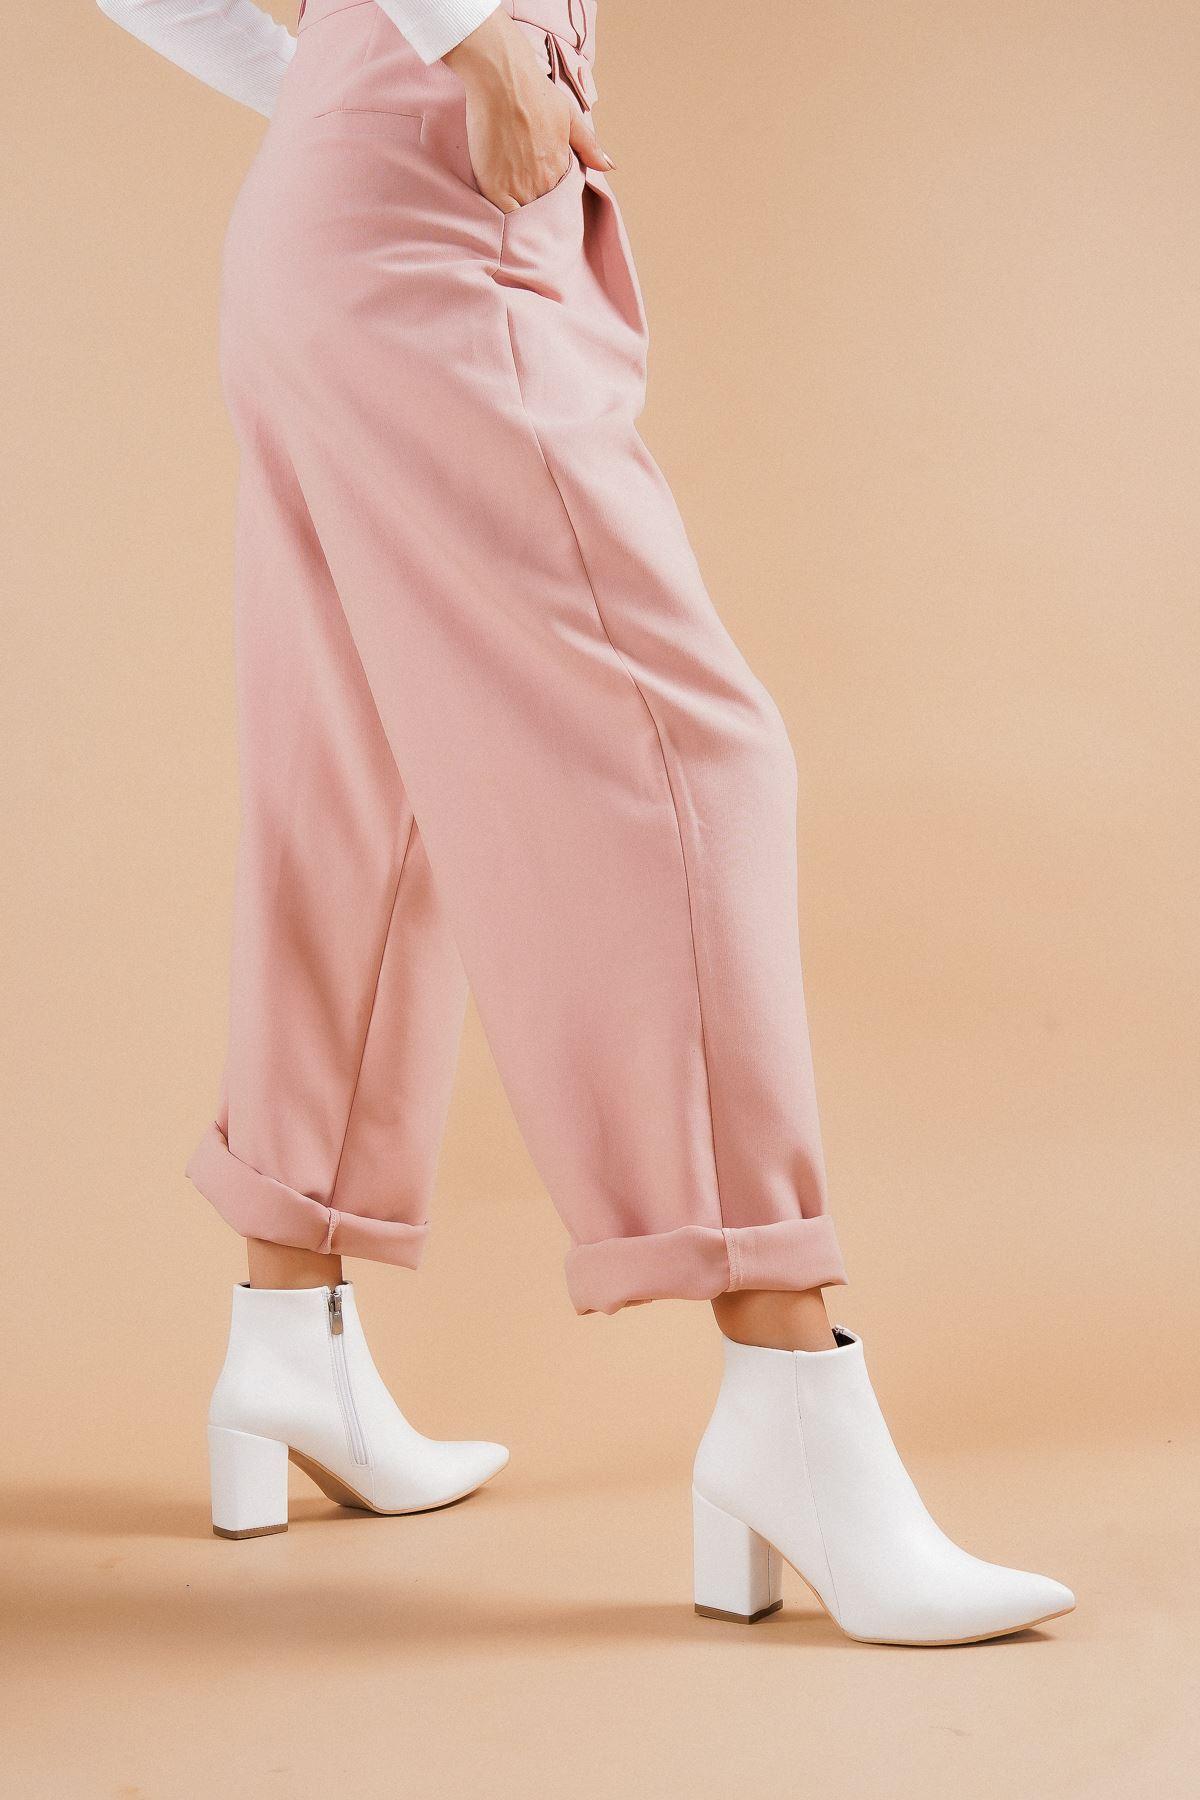 Shank Beyaz Cilt Topuklu Kadın Bot